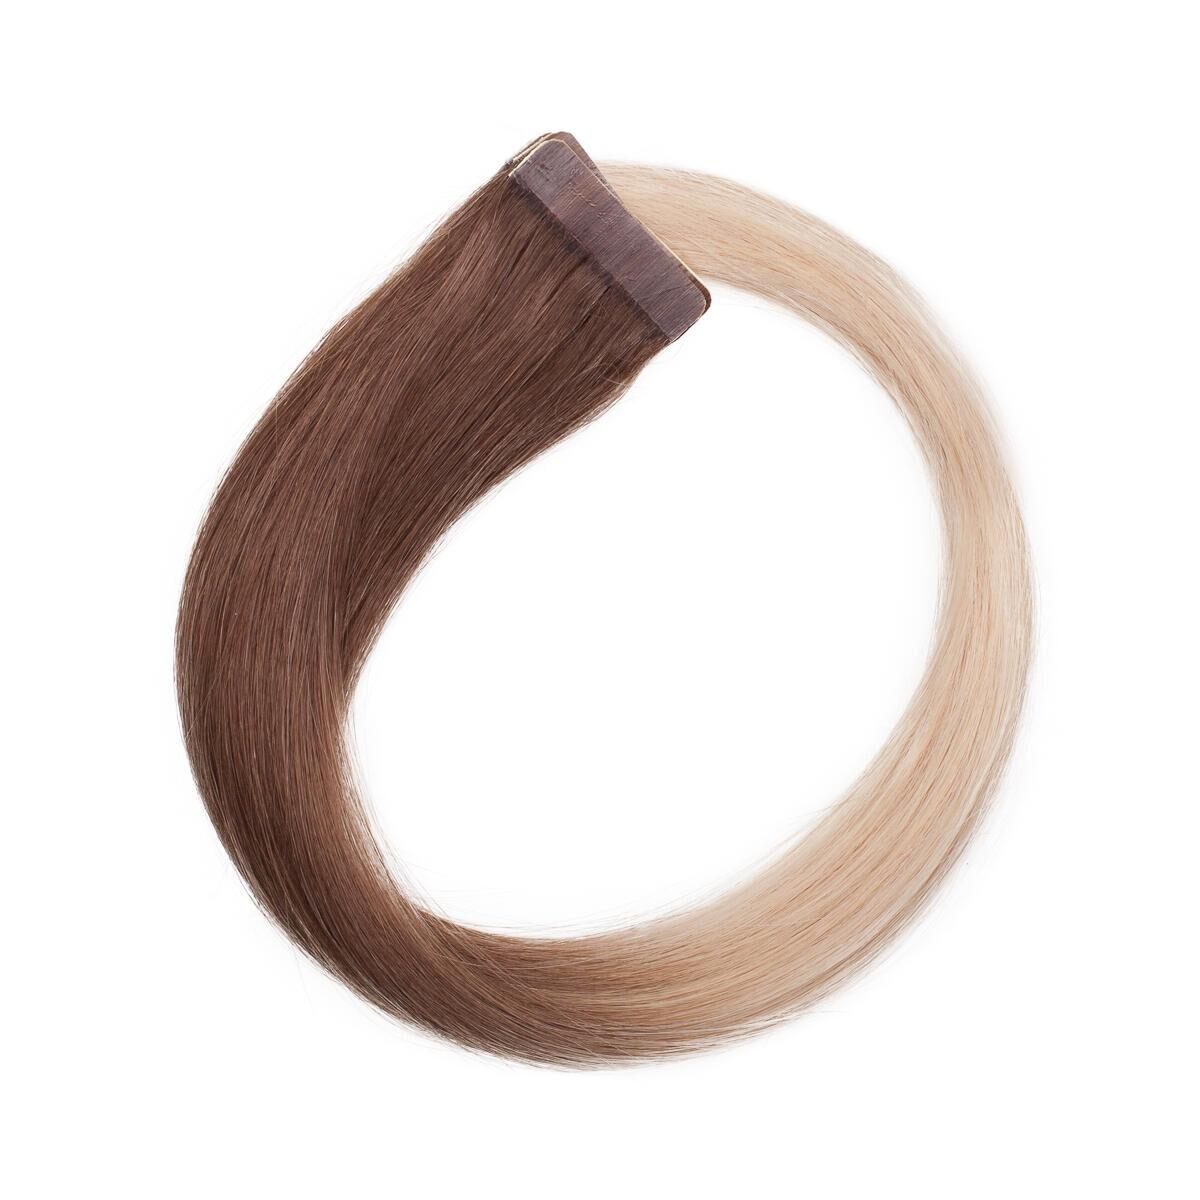 Rapunzel® Äkta löshår Quick & Easy Premium Rakt O5.1/10.8 Medium Ash Blond Ombre 40 cm